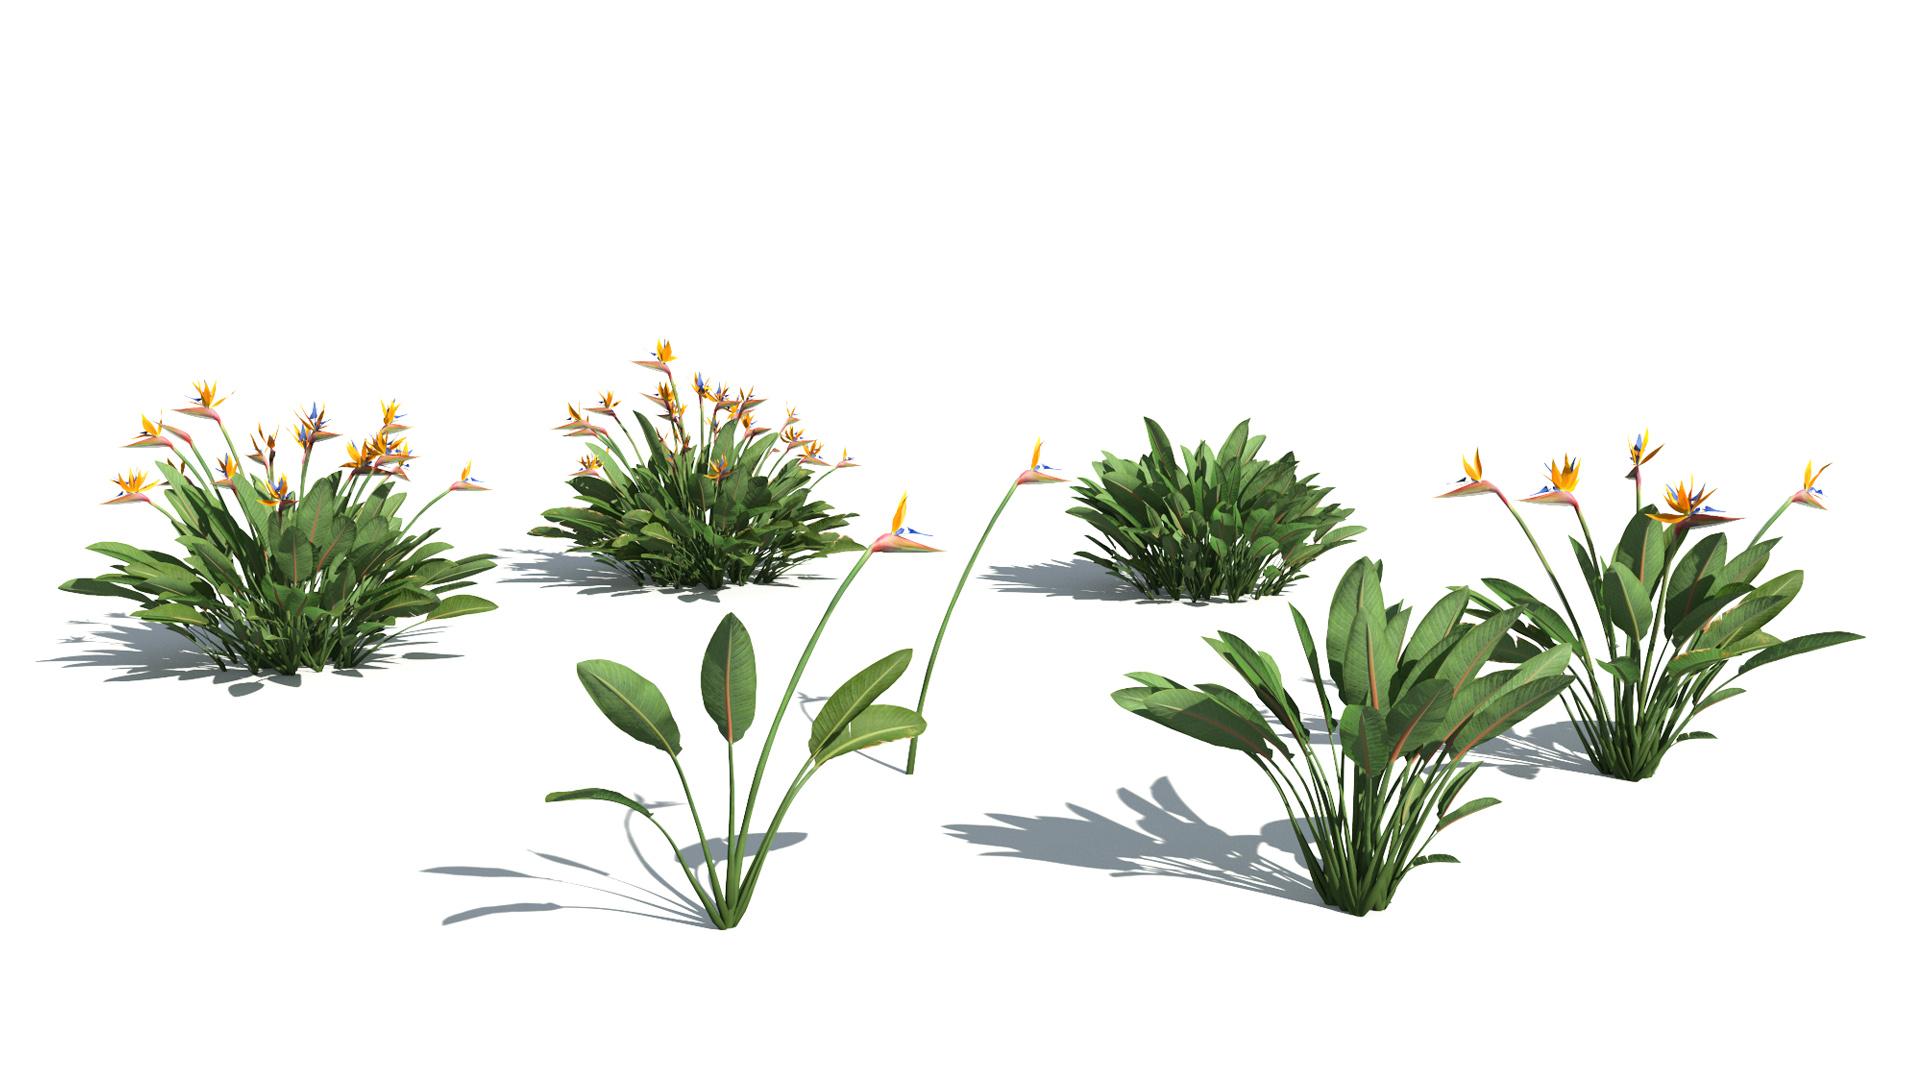 3D model of the Narrow leaved bird of paradise Strelitzia juncea different presets